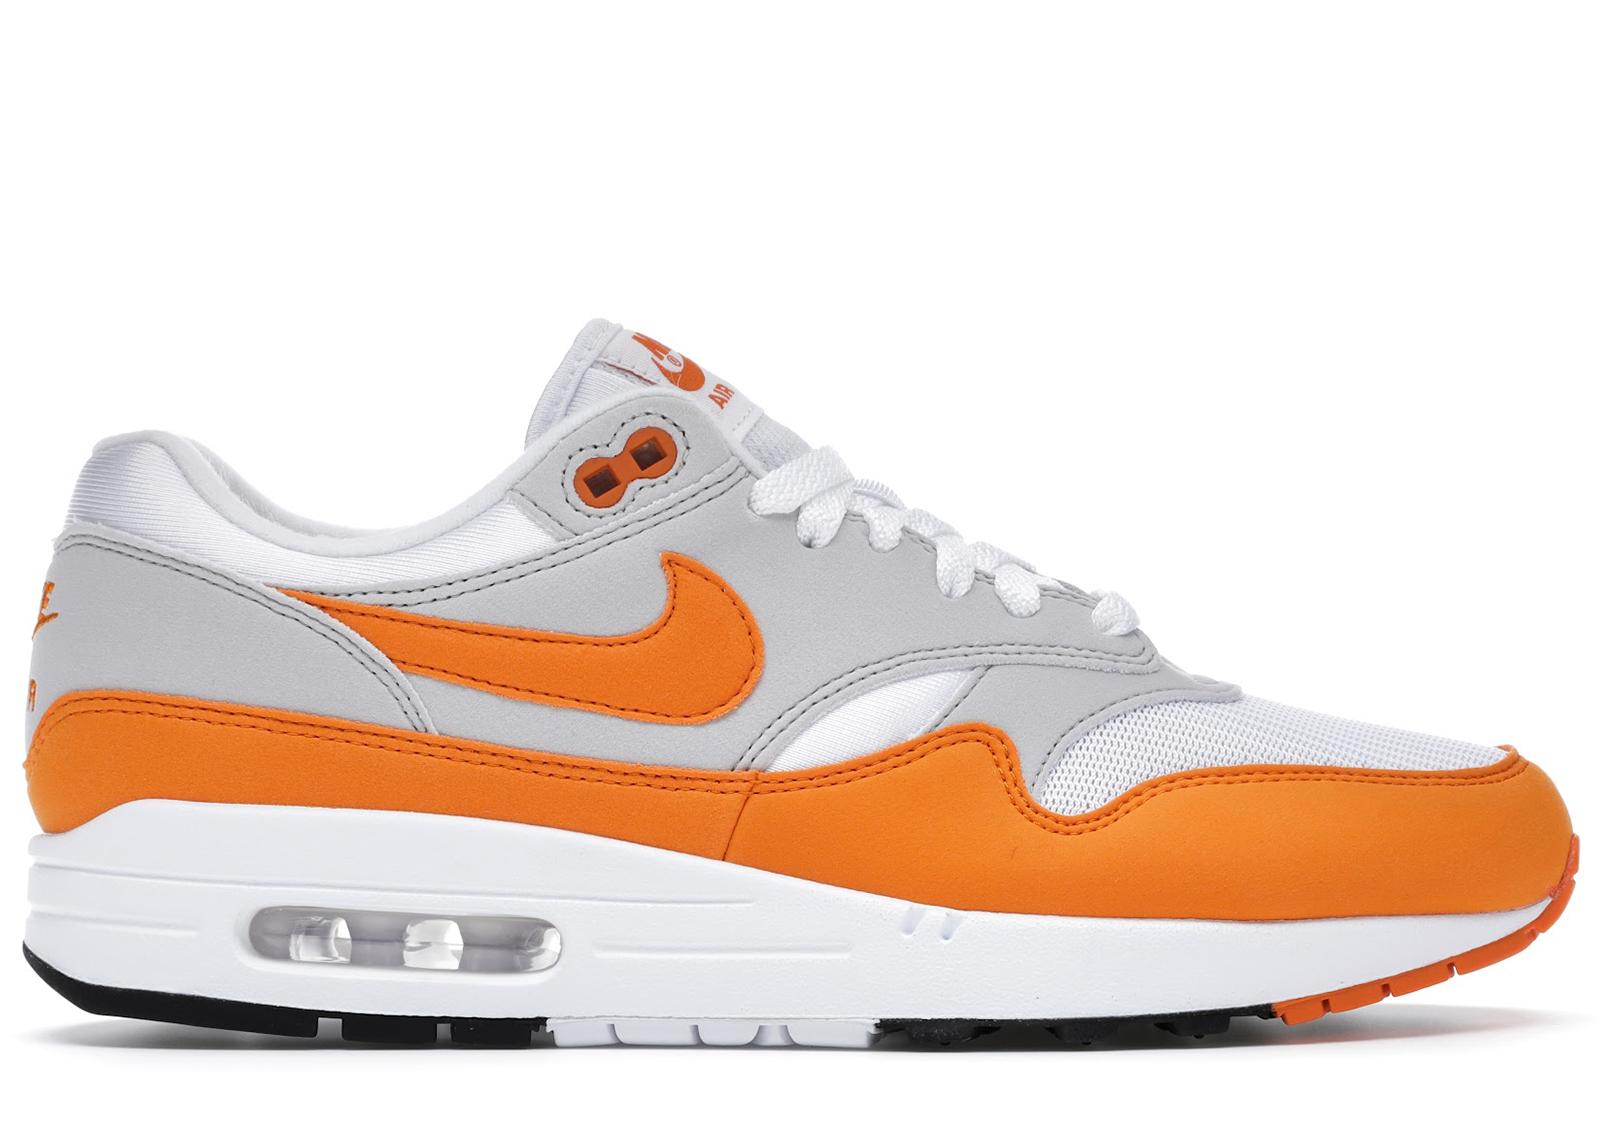 Nike Air Max 1 Anniversary Orange (2020)